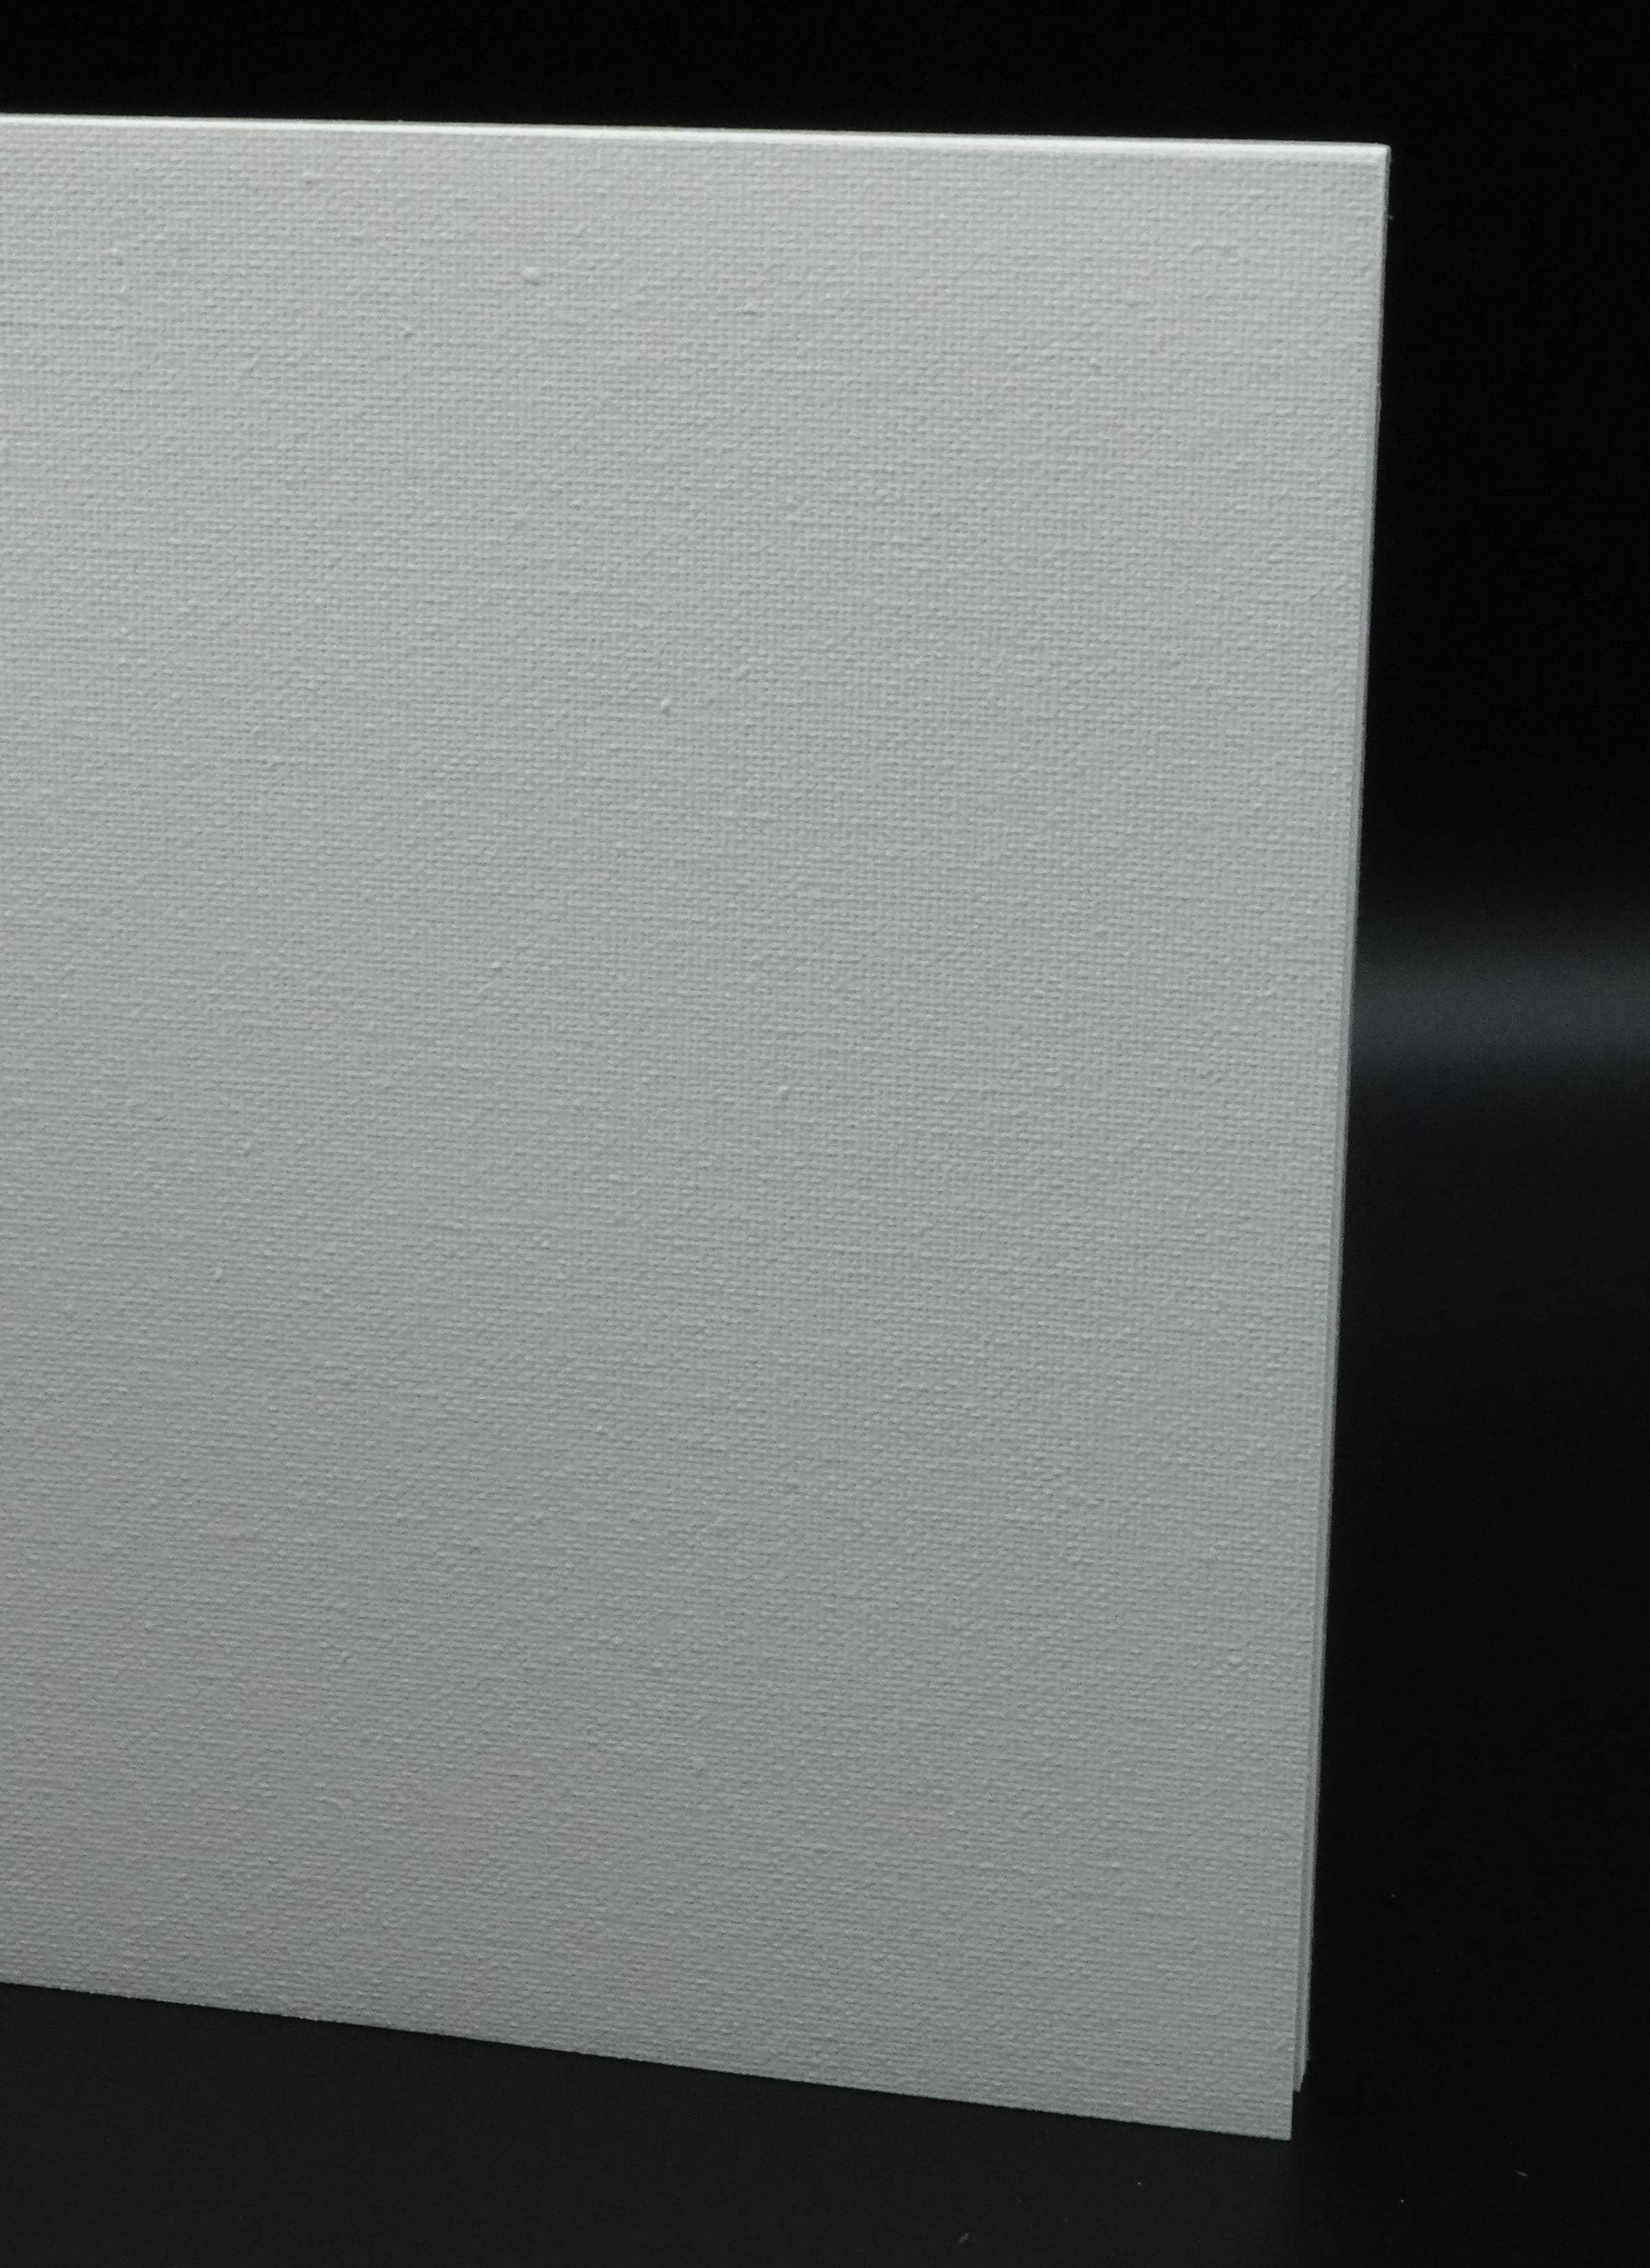 Mont Marte® Canvas blok 10st A5 - 280 grams papier - schetsboek